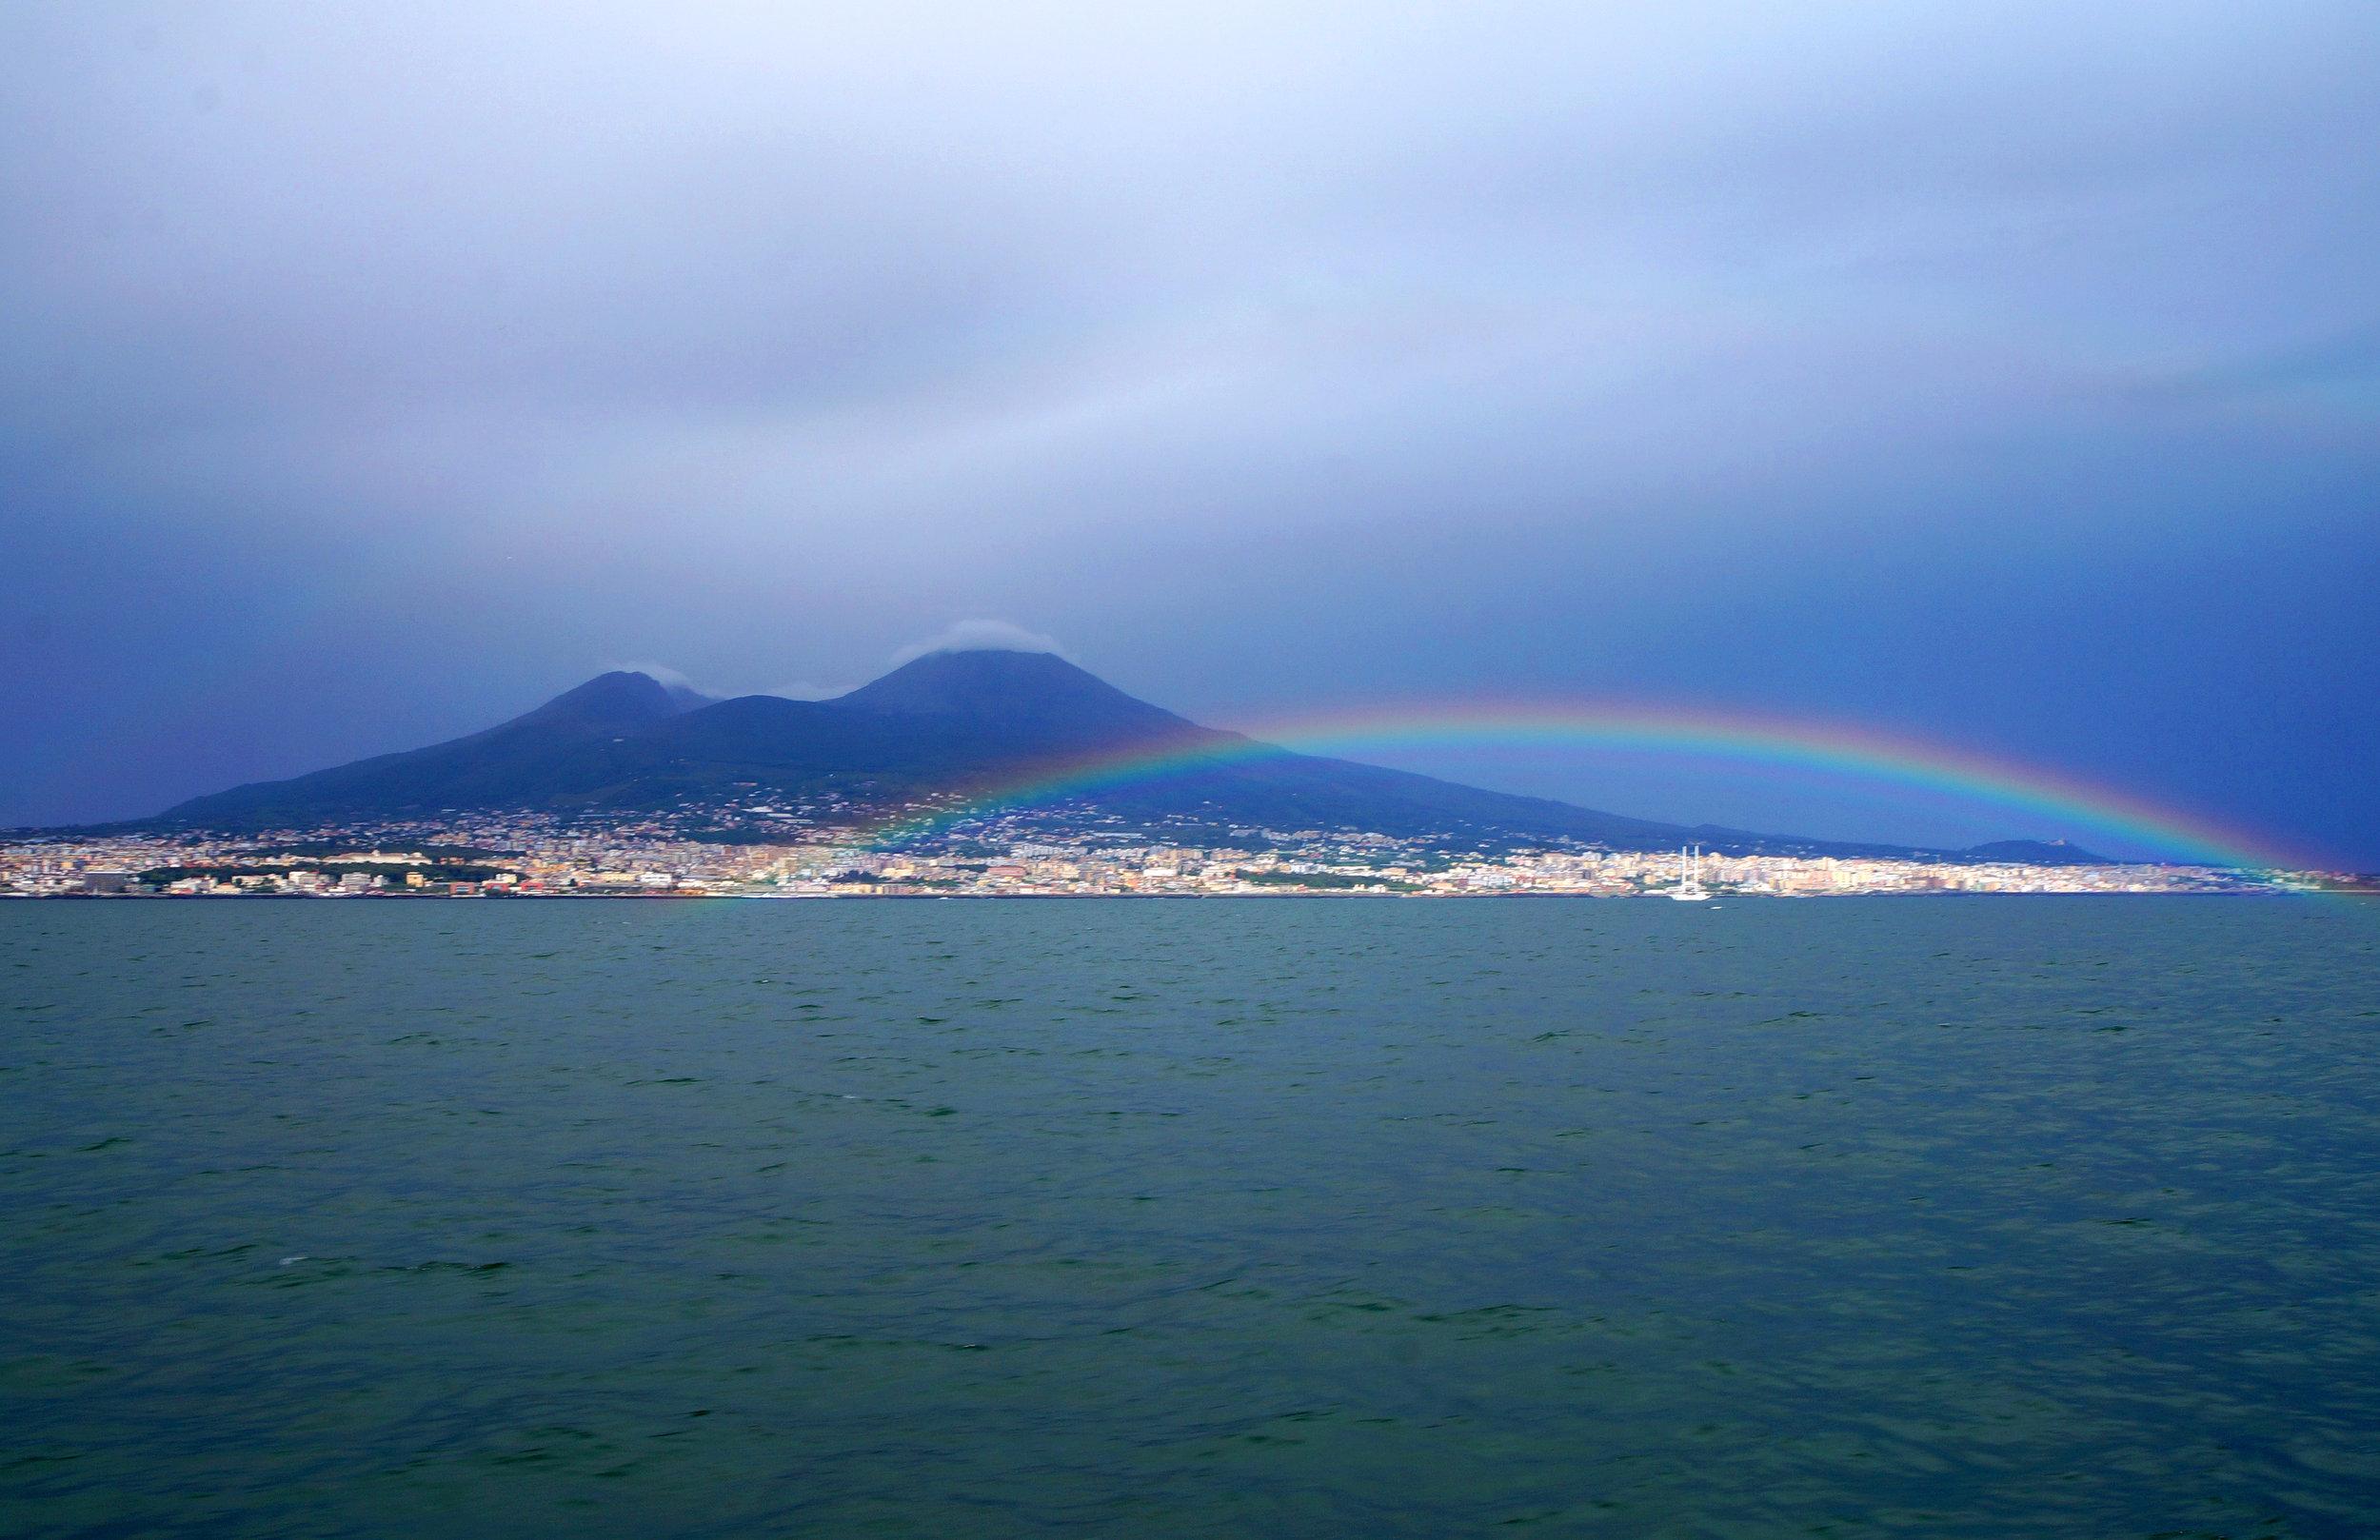 08719_ITALY2016_rainbow_vesuvius_11x17_v2.jpg